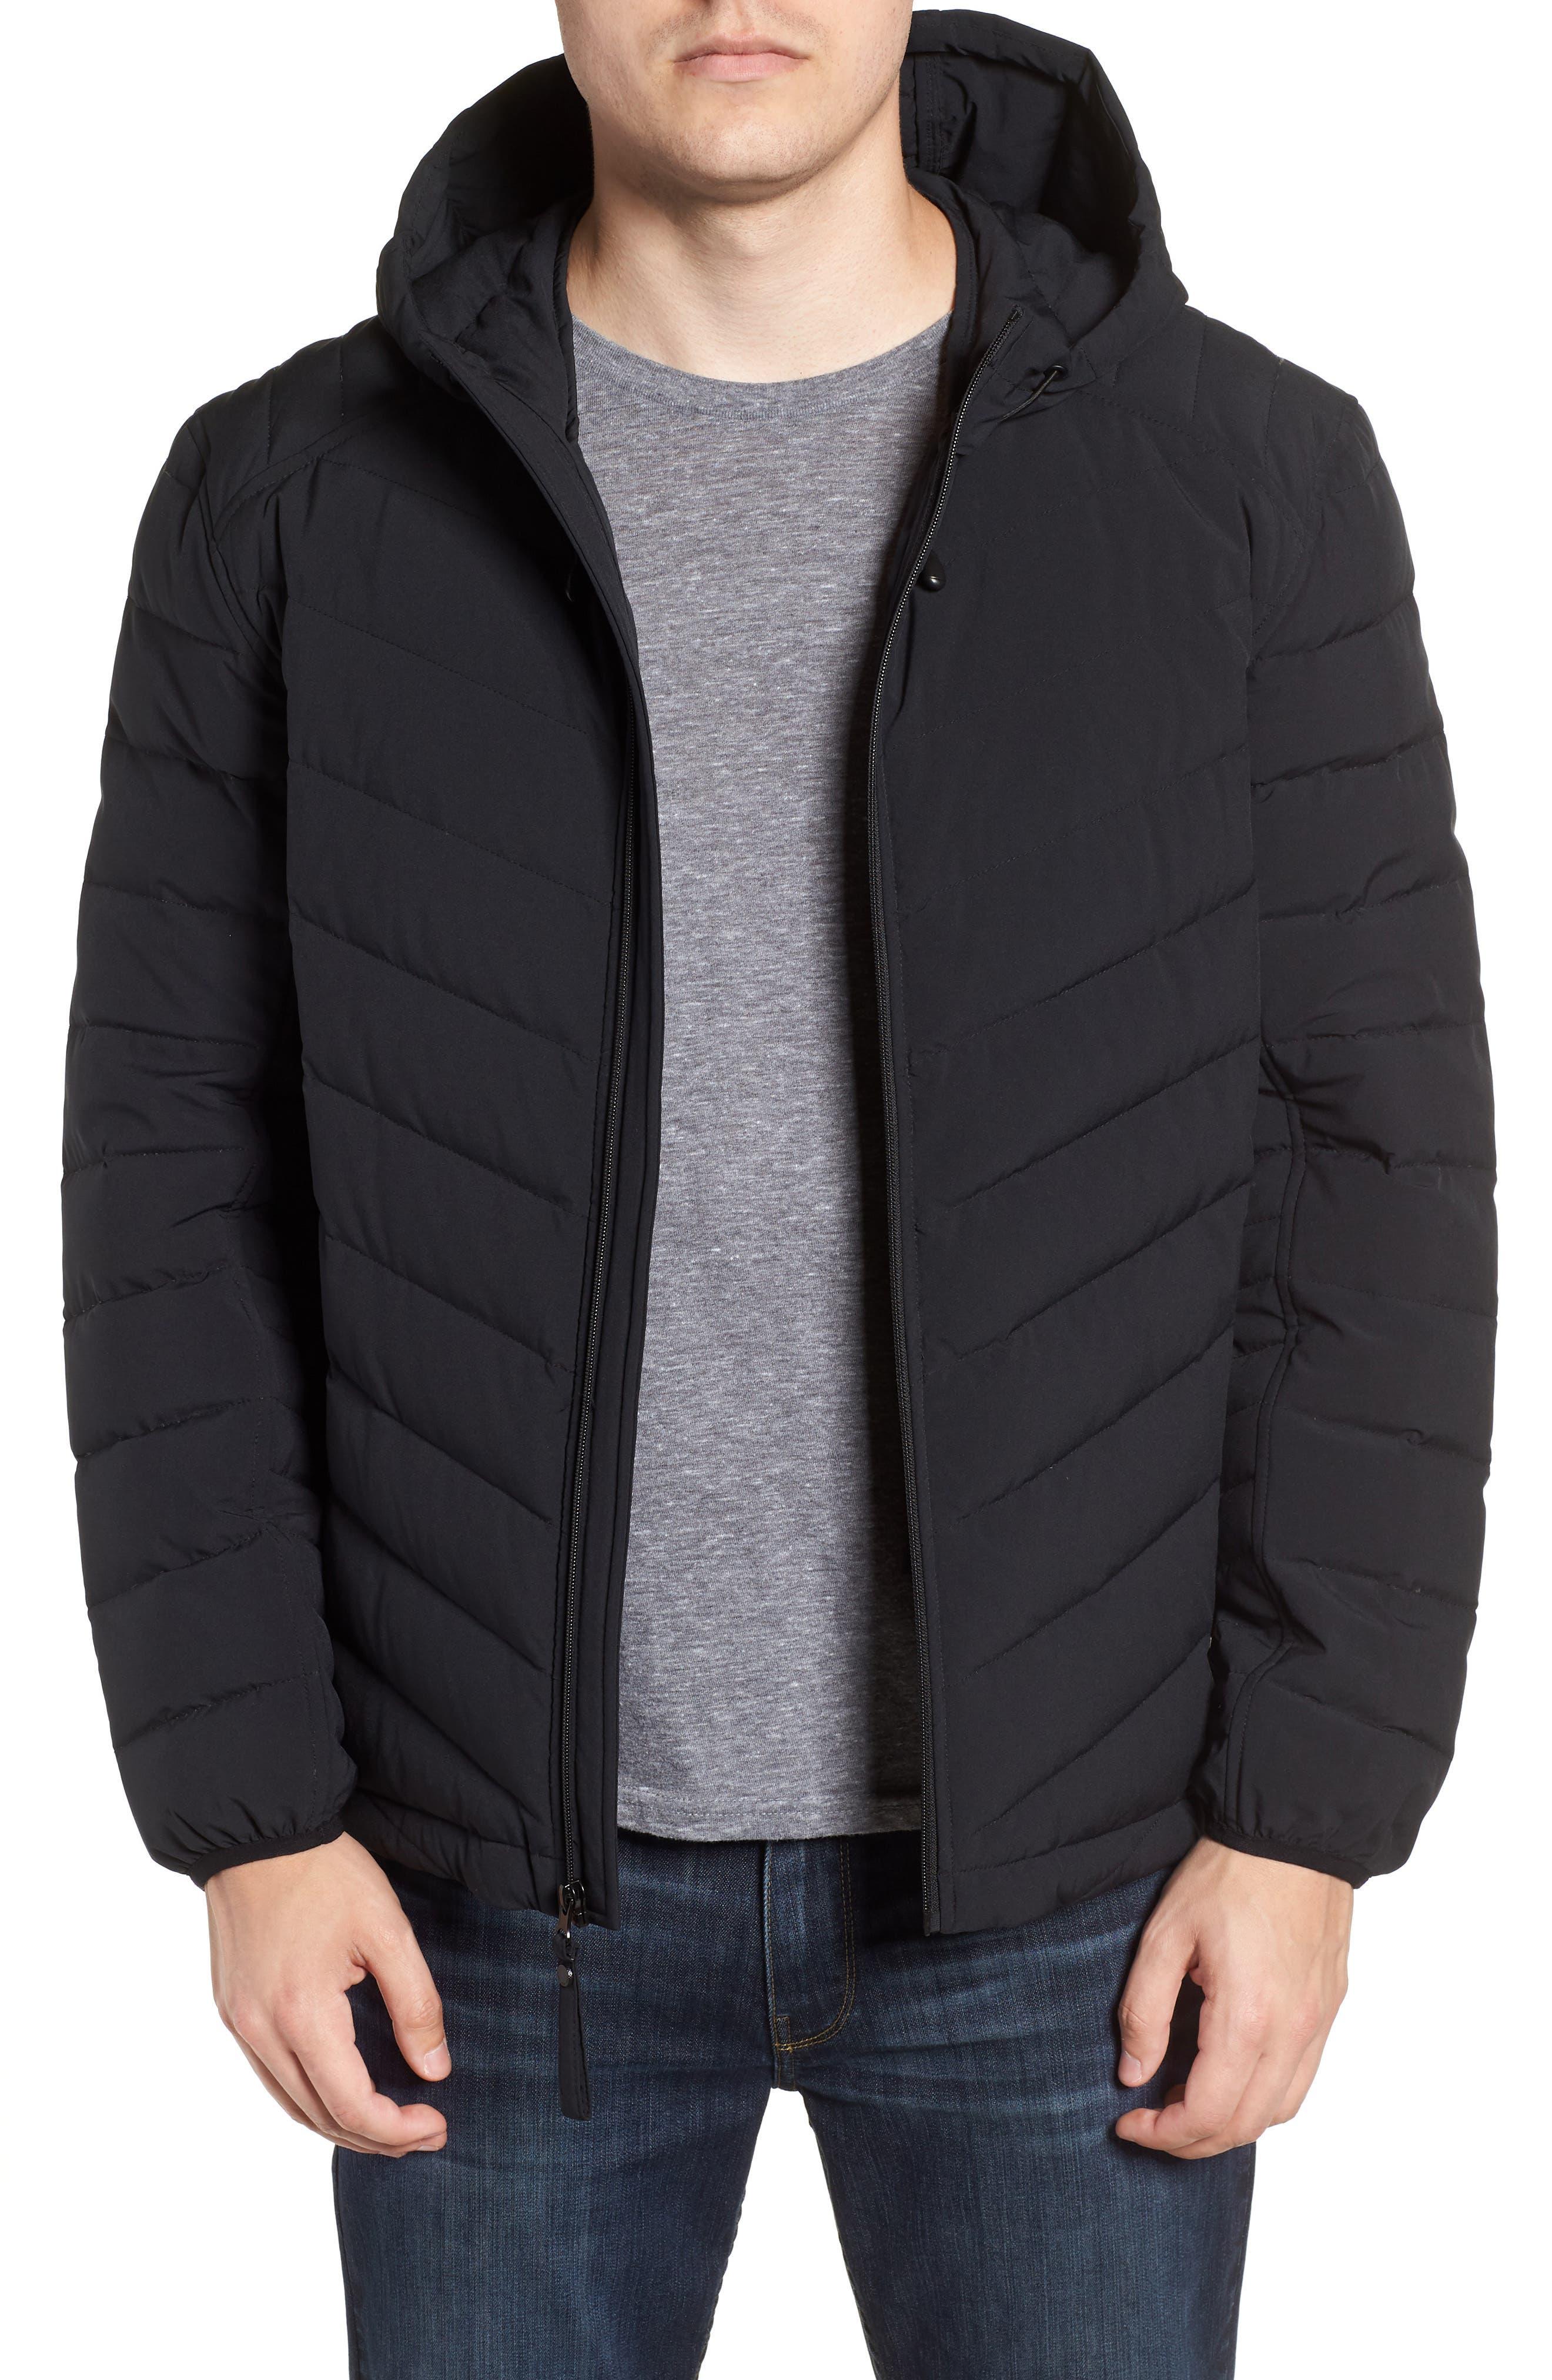 MARC NEW YORK, Delavan Down Hooded Jacket, Main thumbnail 1, color, BLACK